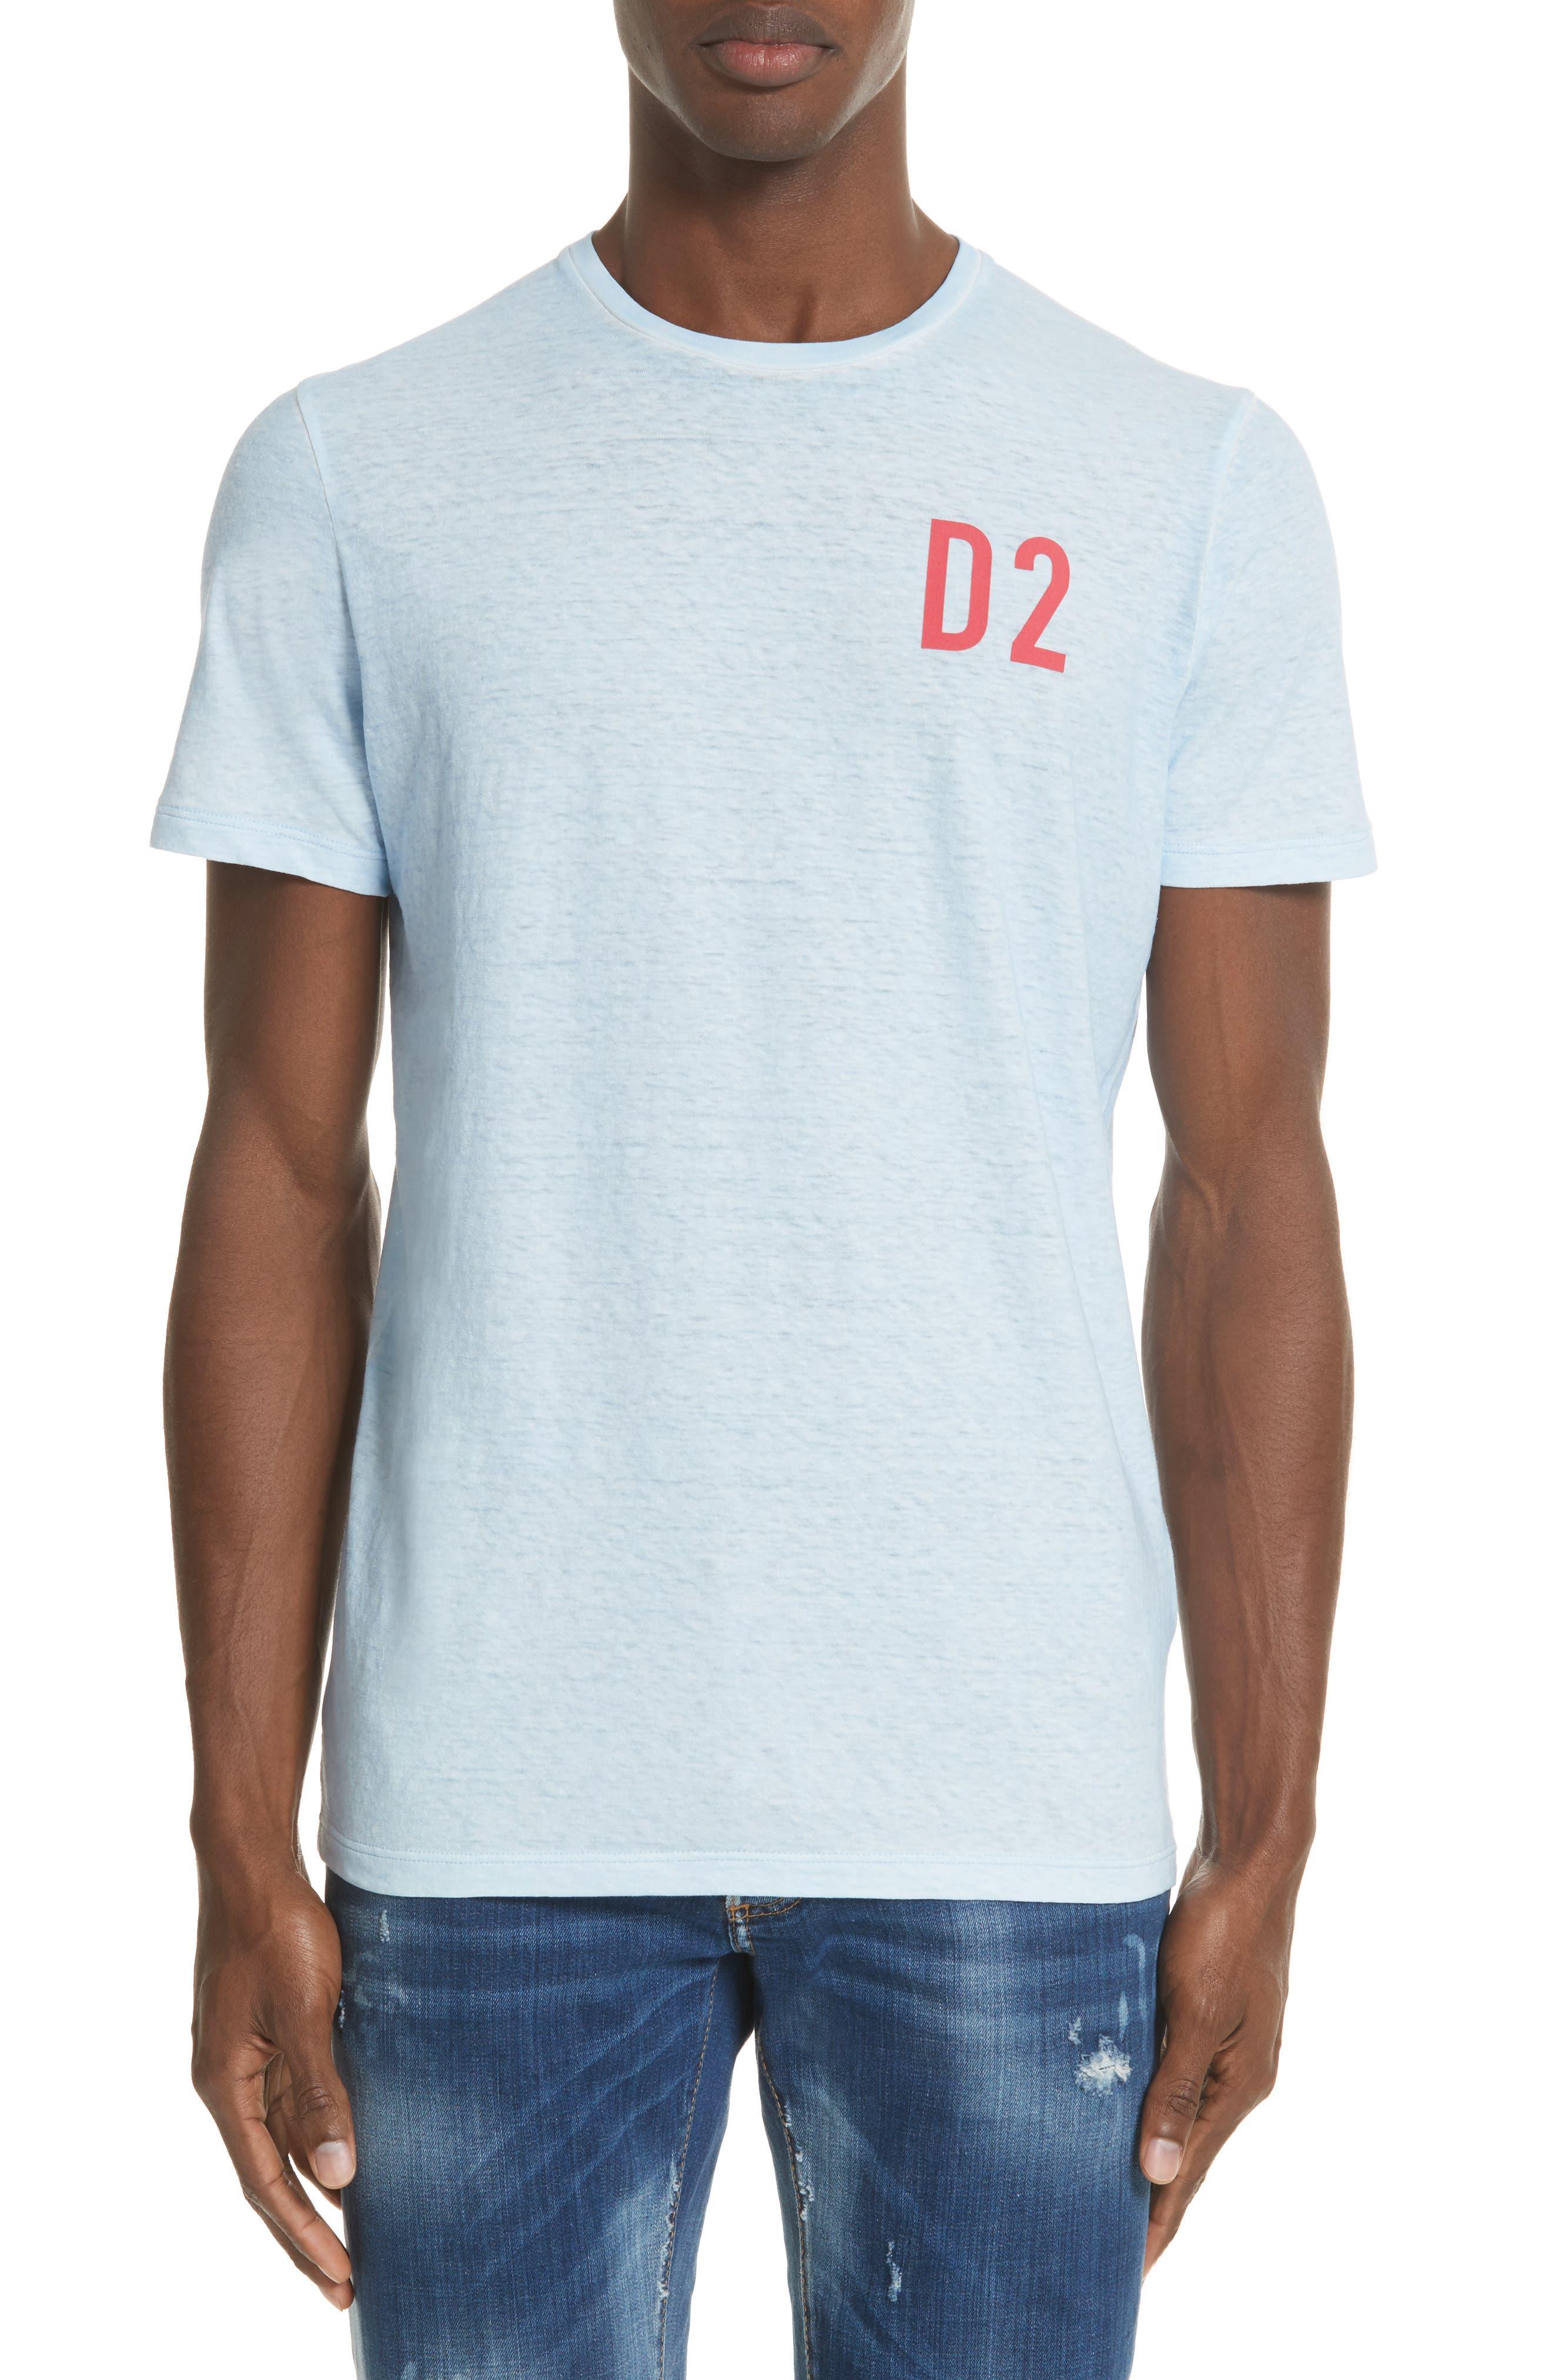 Main Image - Dsquared2 D2 Logo Graphic T-Shirt